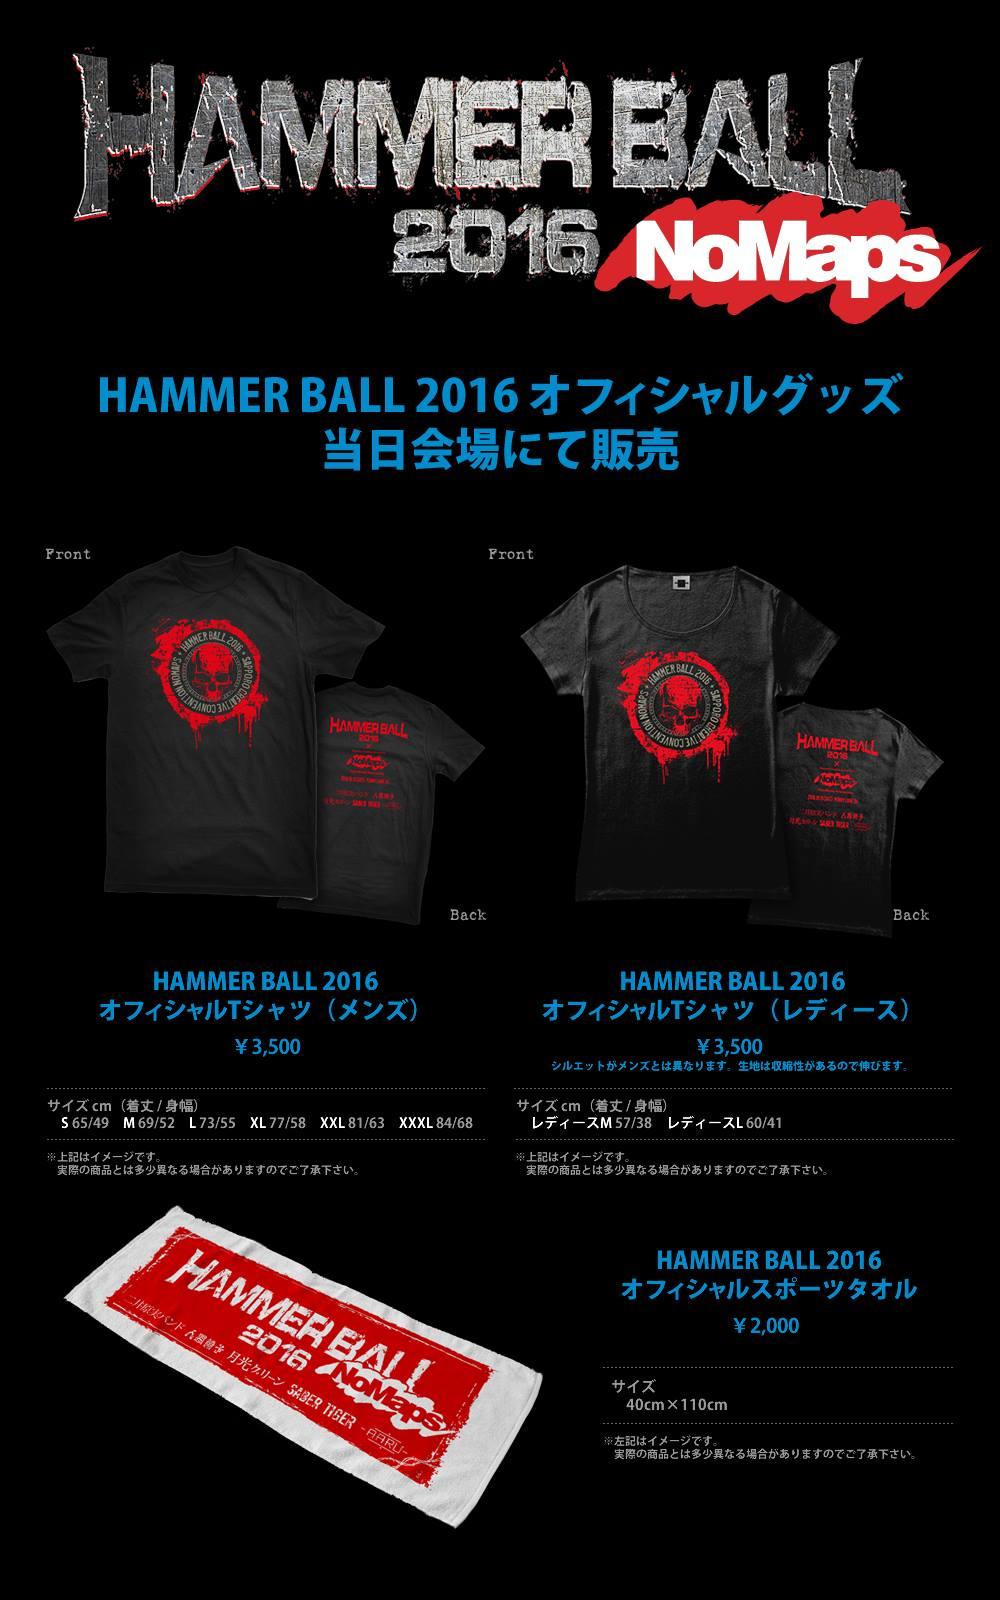 2016 HAMMER BALL ���䥰�å�